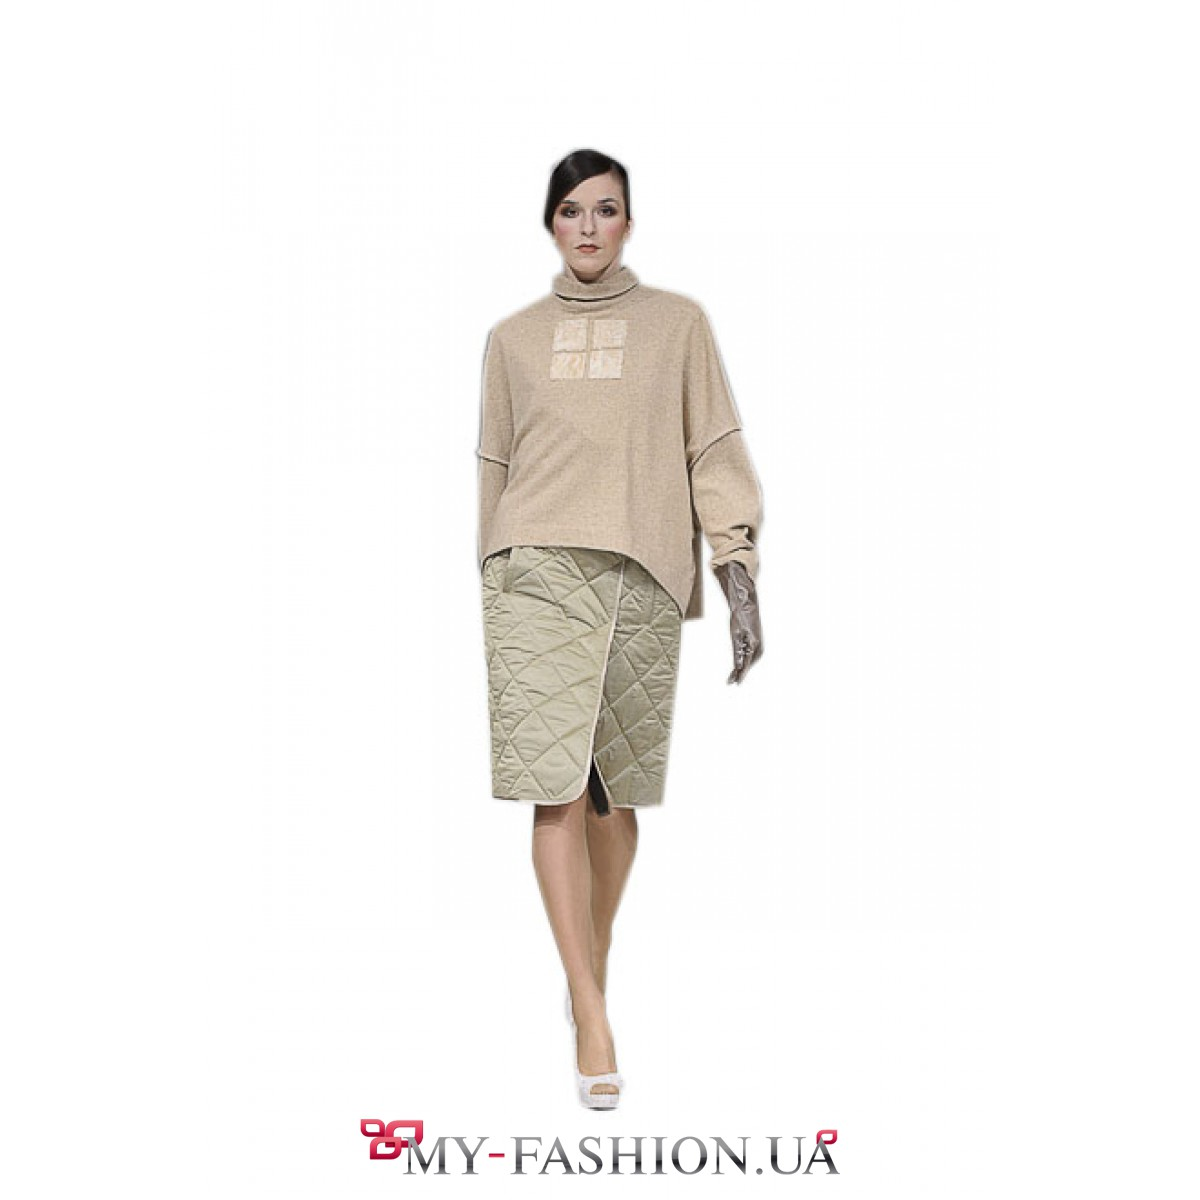 Бежевая юбка с доставкой